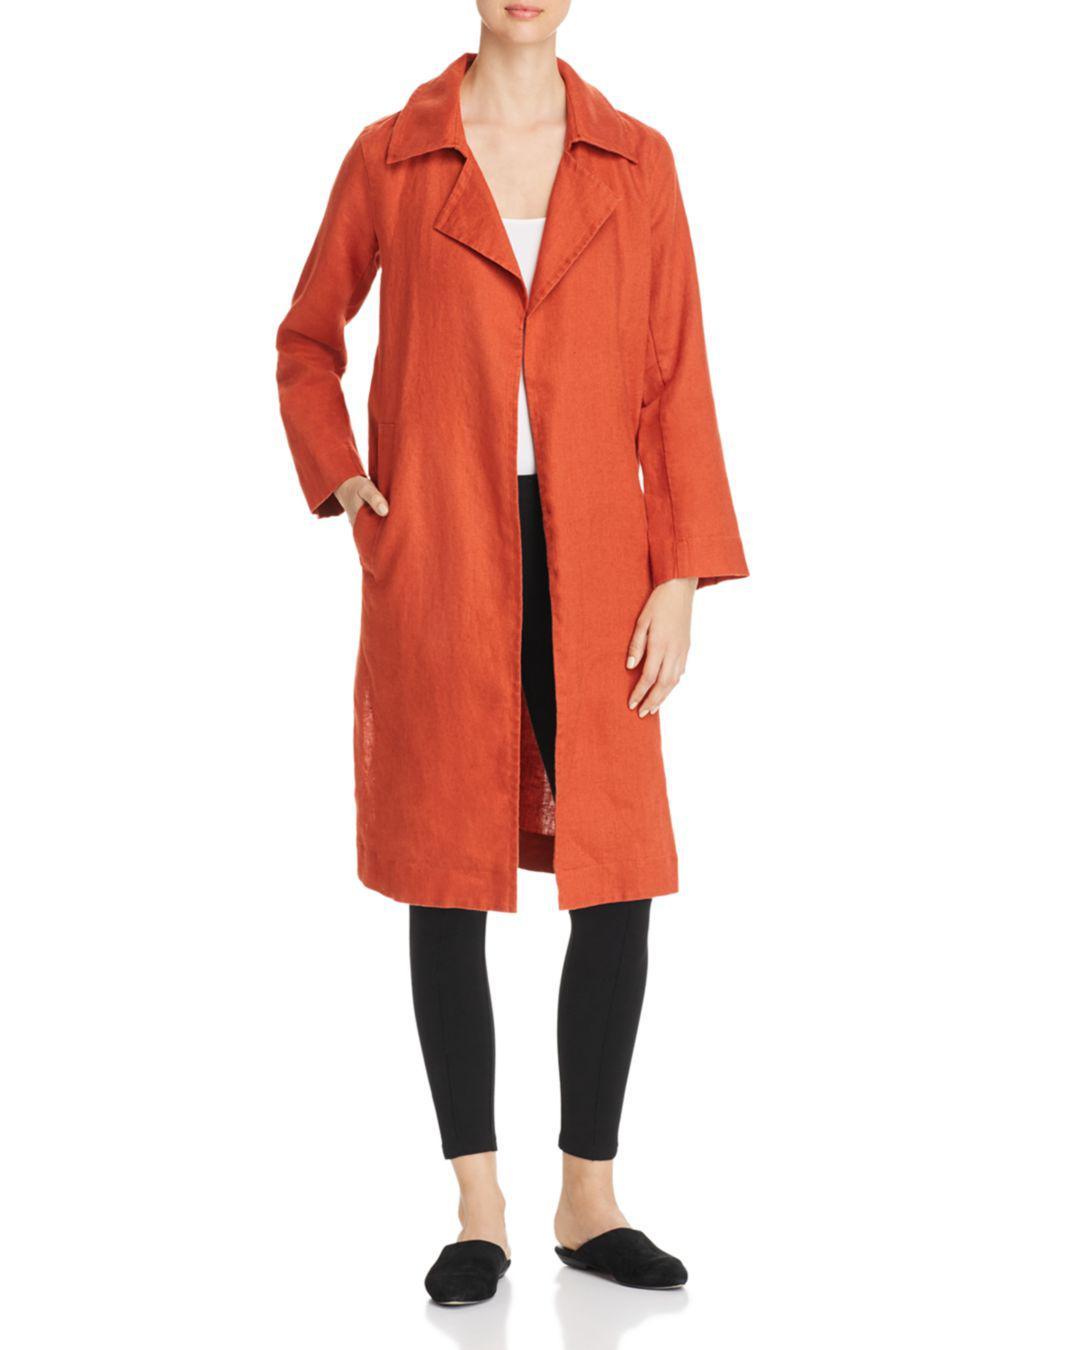 19f5b6fc071 Lyst - Eileen Fisher Organic Linen Open Trench Coat in Orange